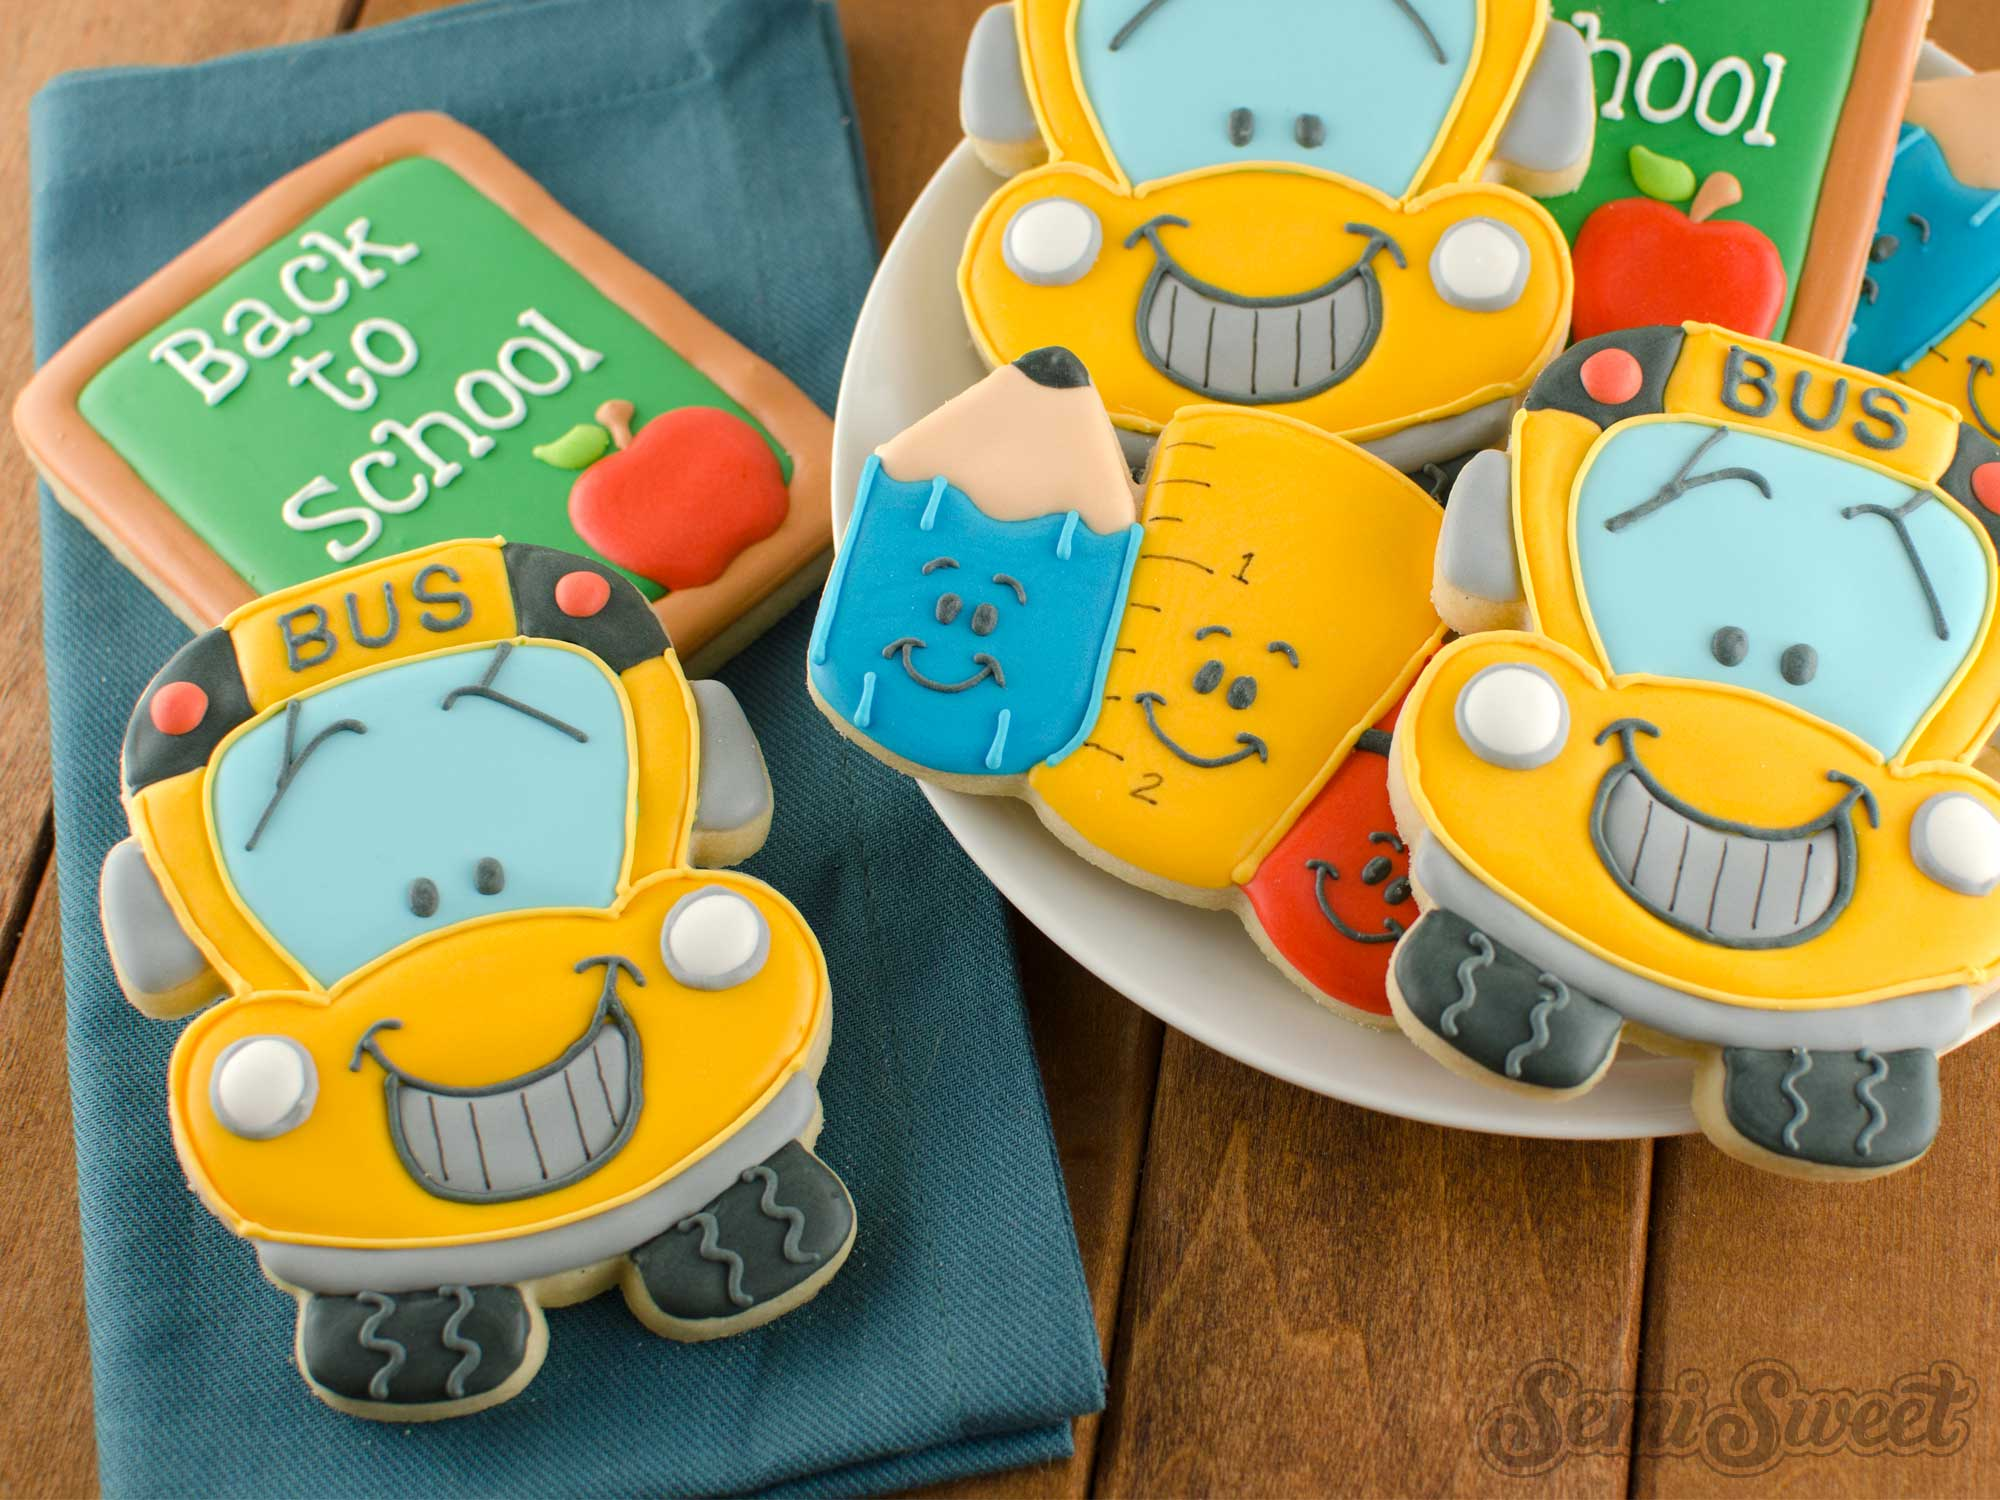 How to Make School Bus Cookies